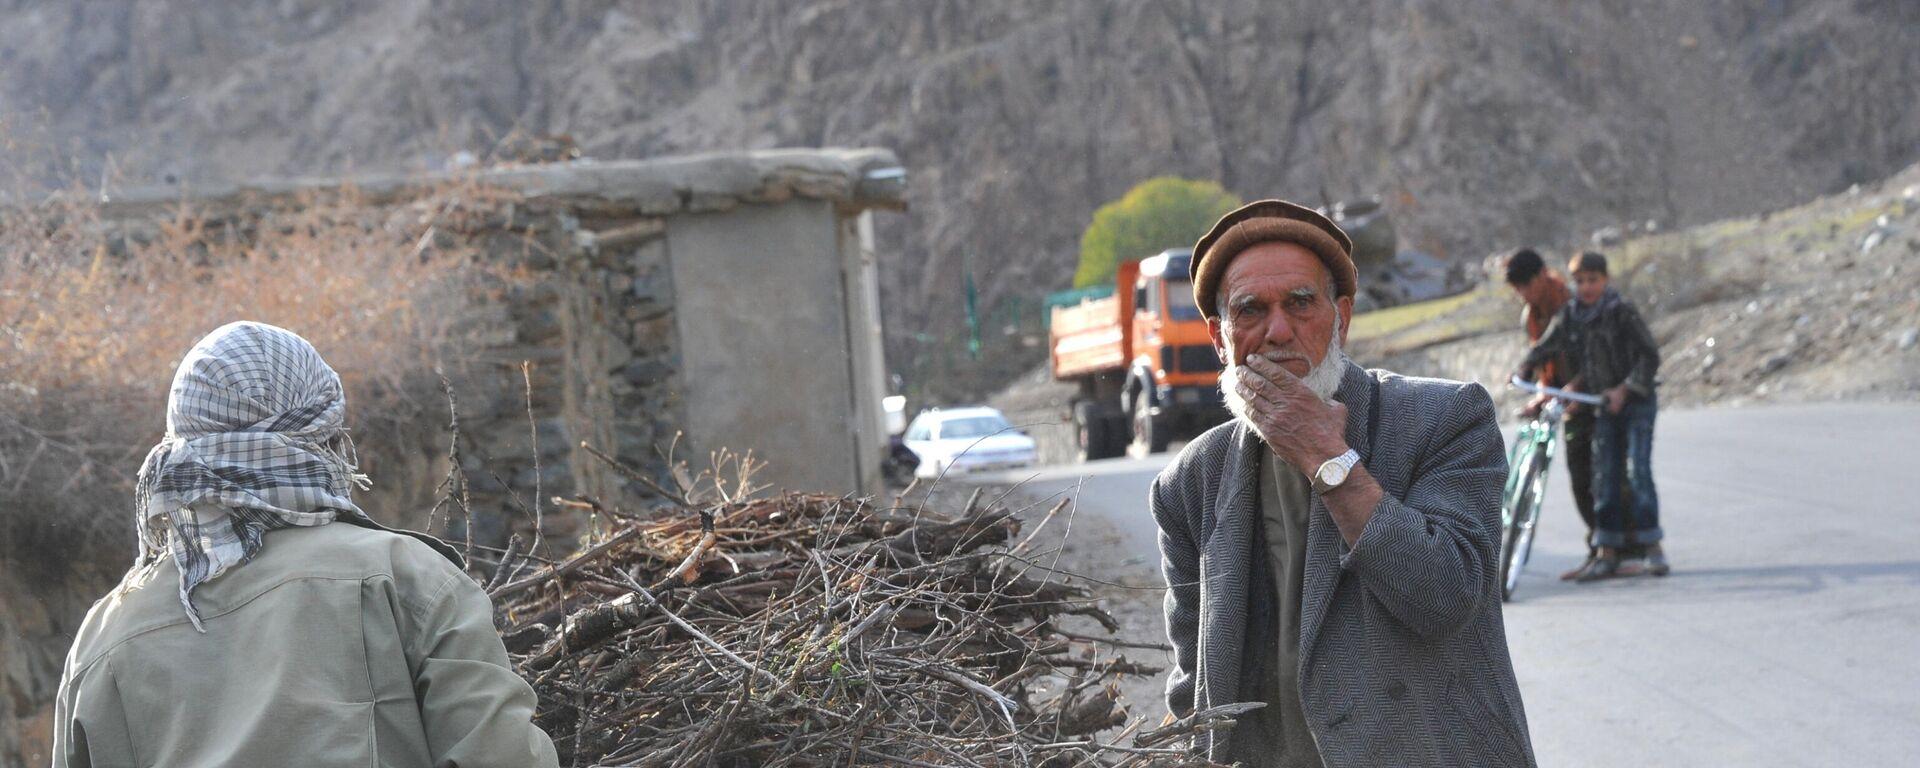 Panjshir, una provincia dell'Afghanistan - Sputnik Italia, 1920, 22.09.2021